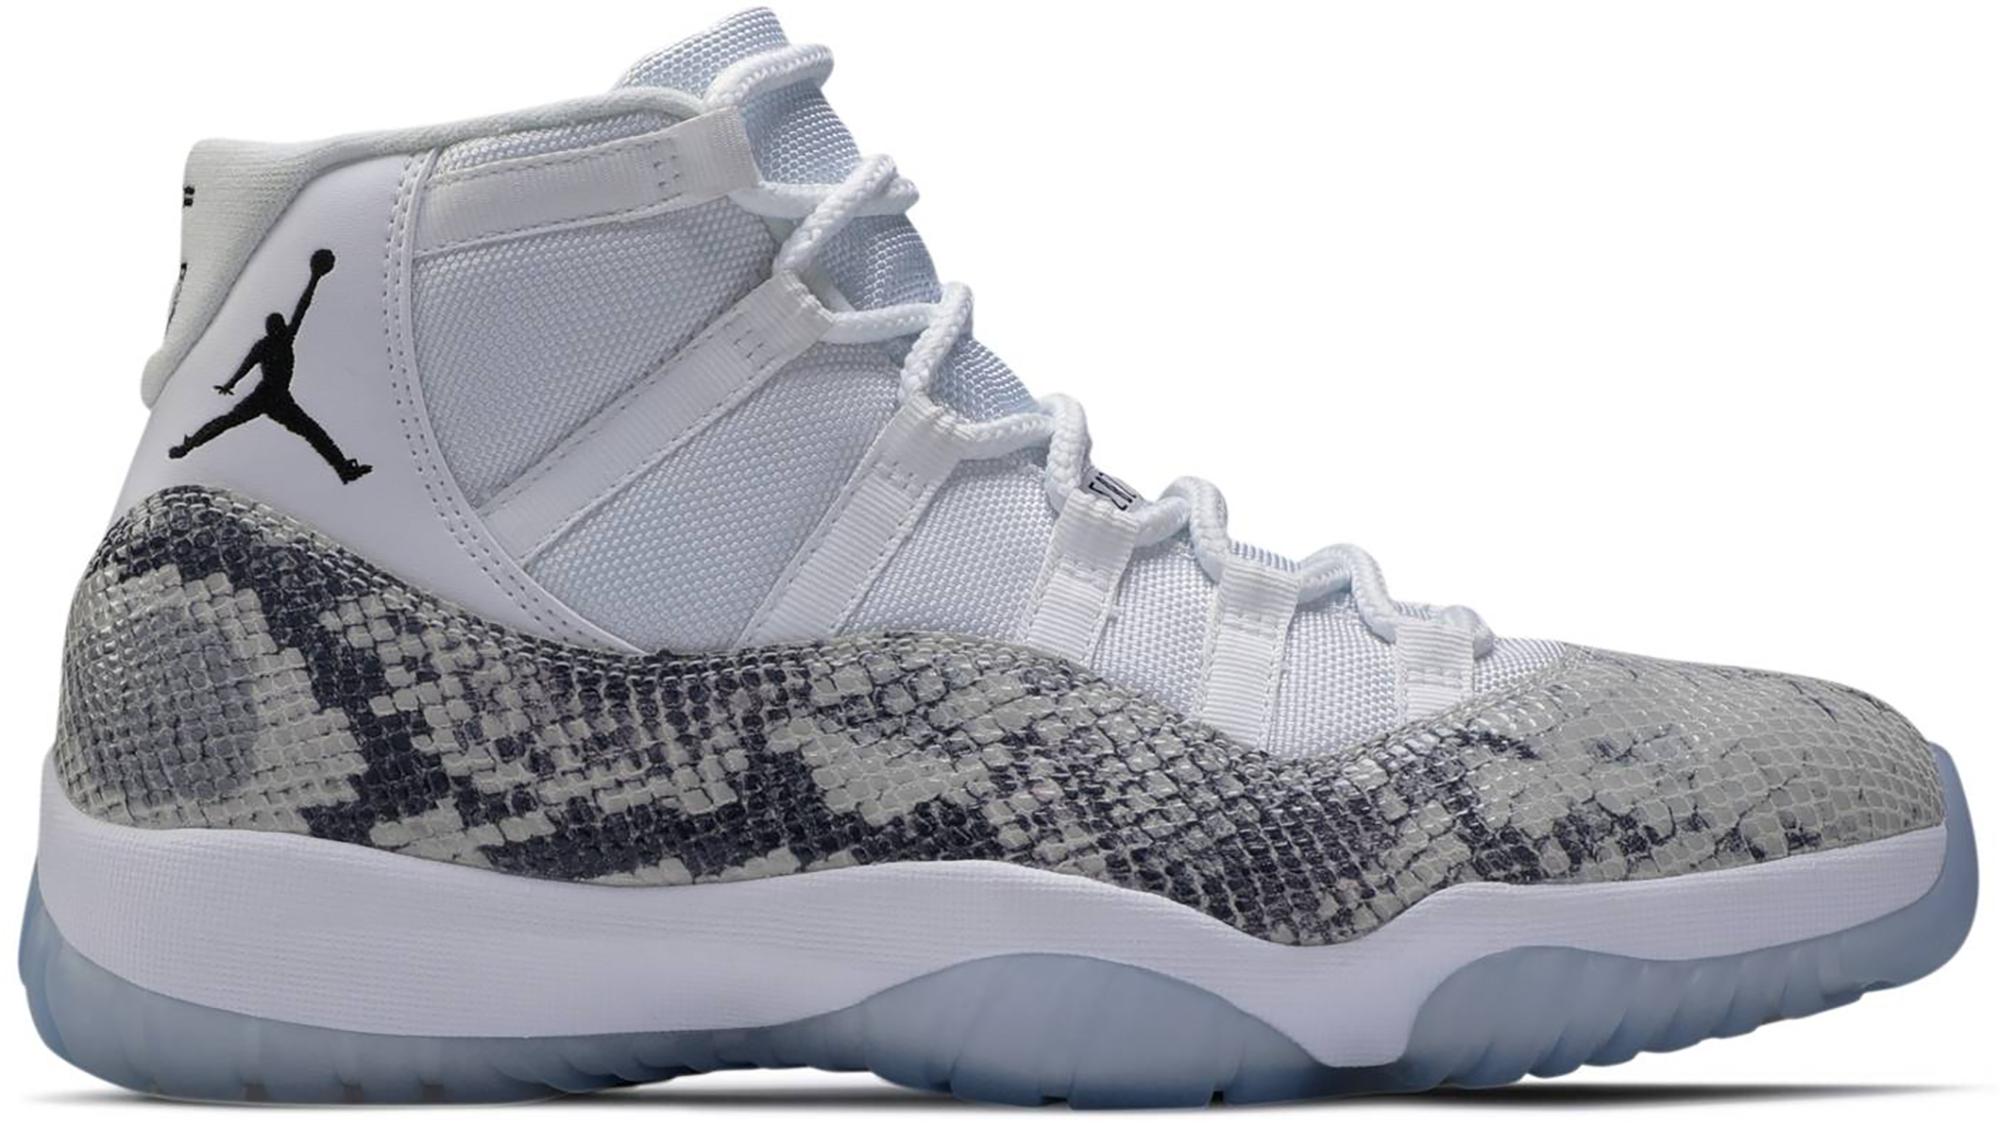 gray and white 11 jordans